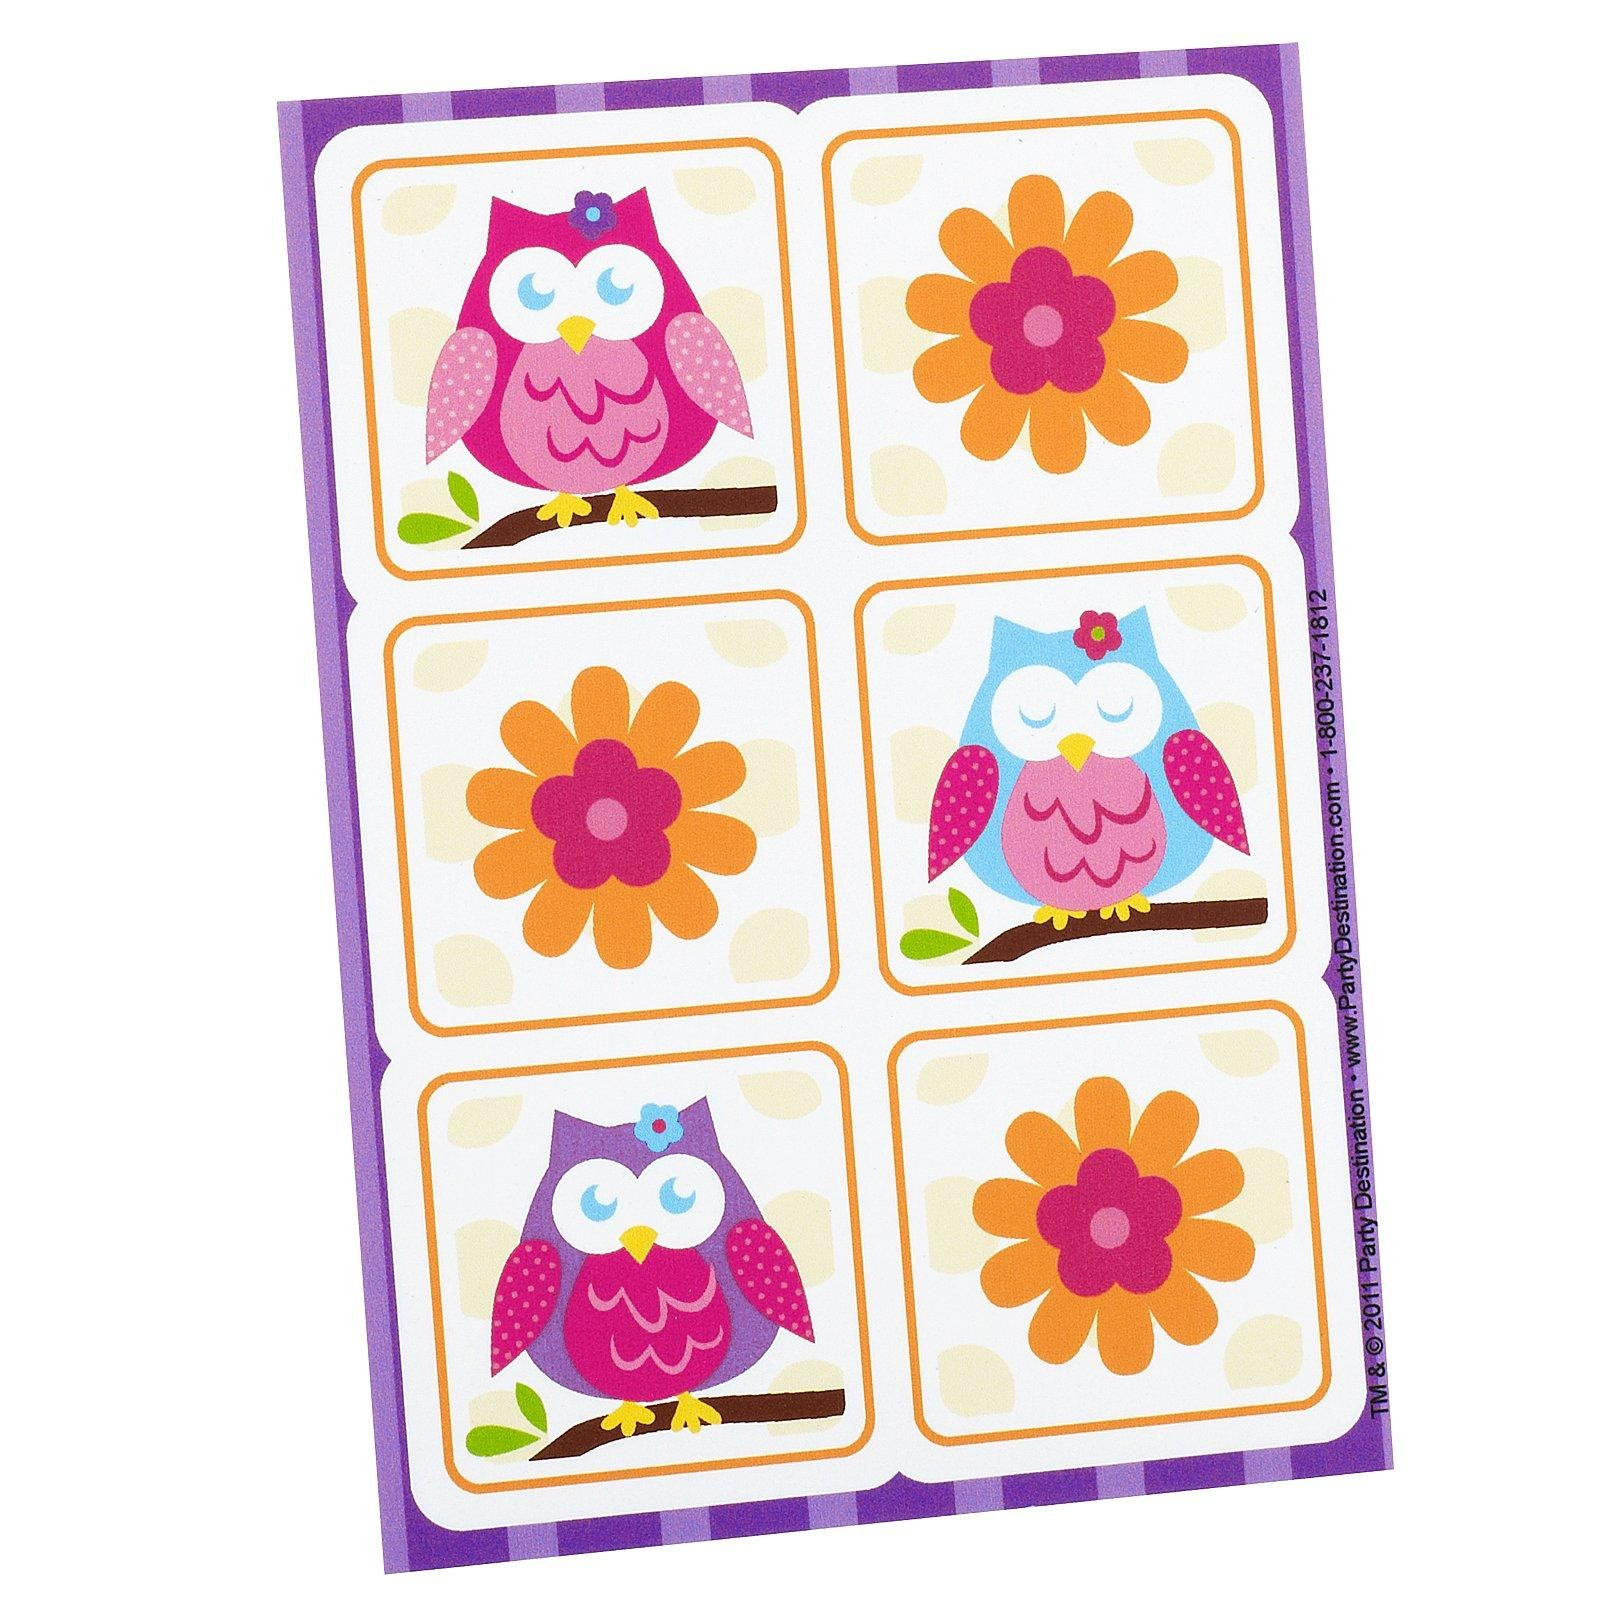 Owl Blossom Sticker Sheets from BirthdayExpress.com